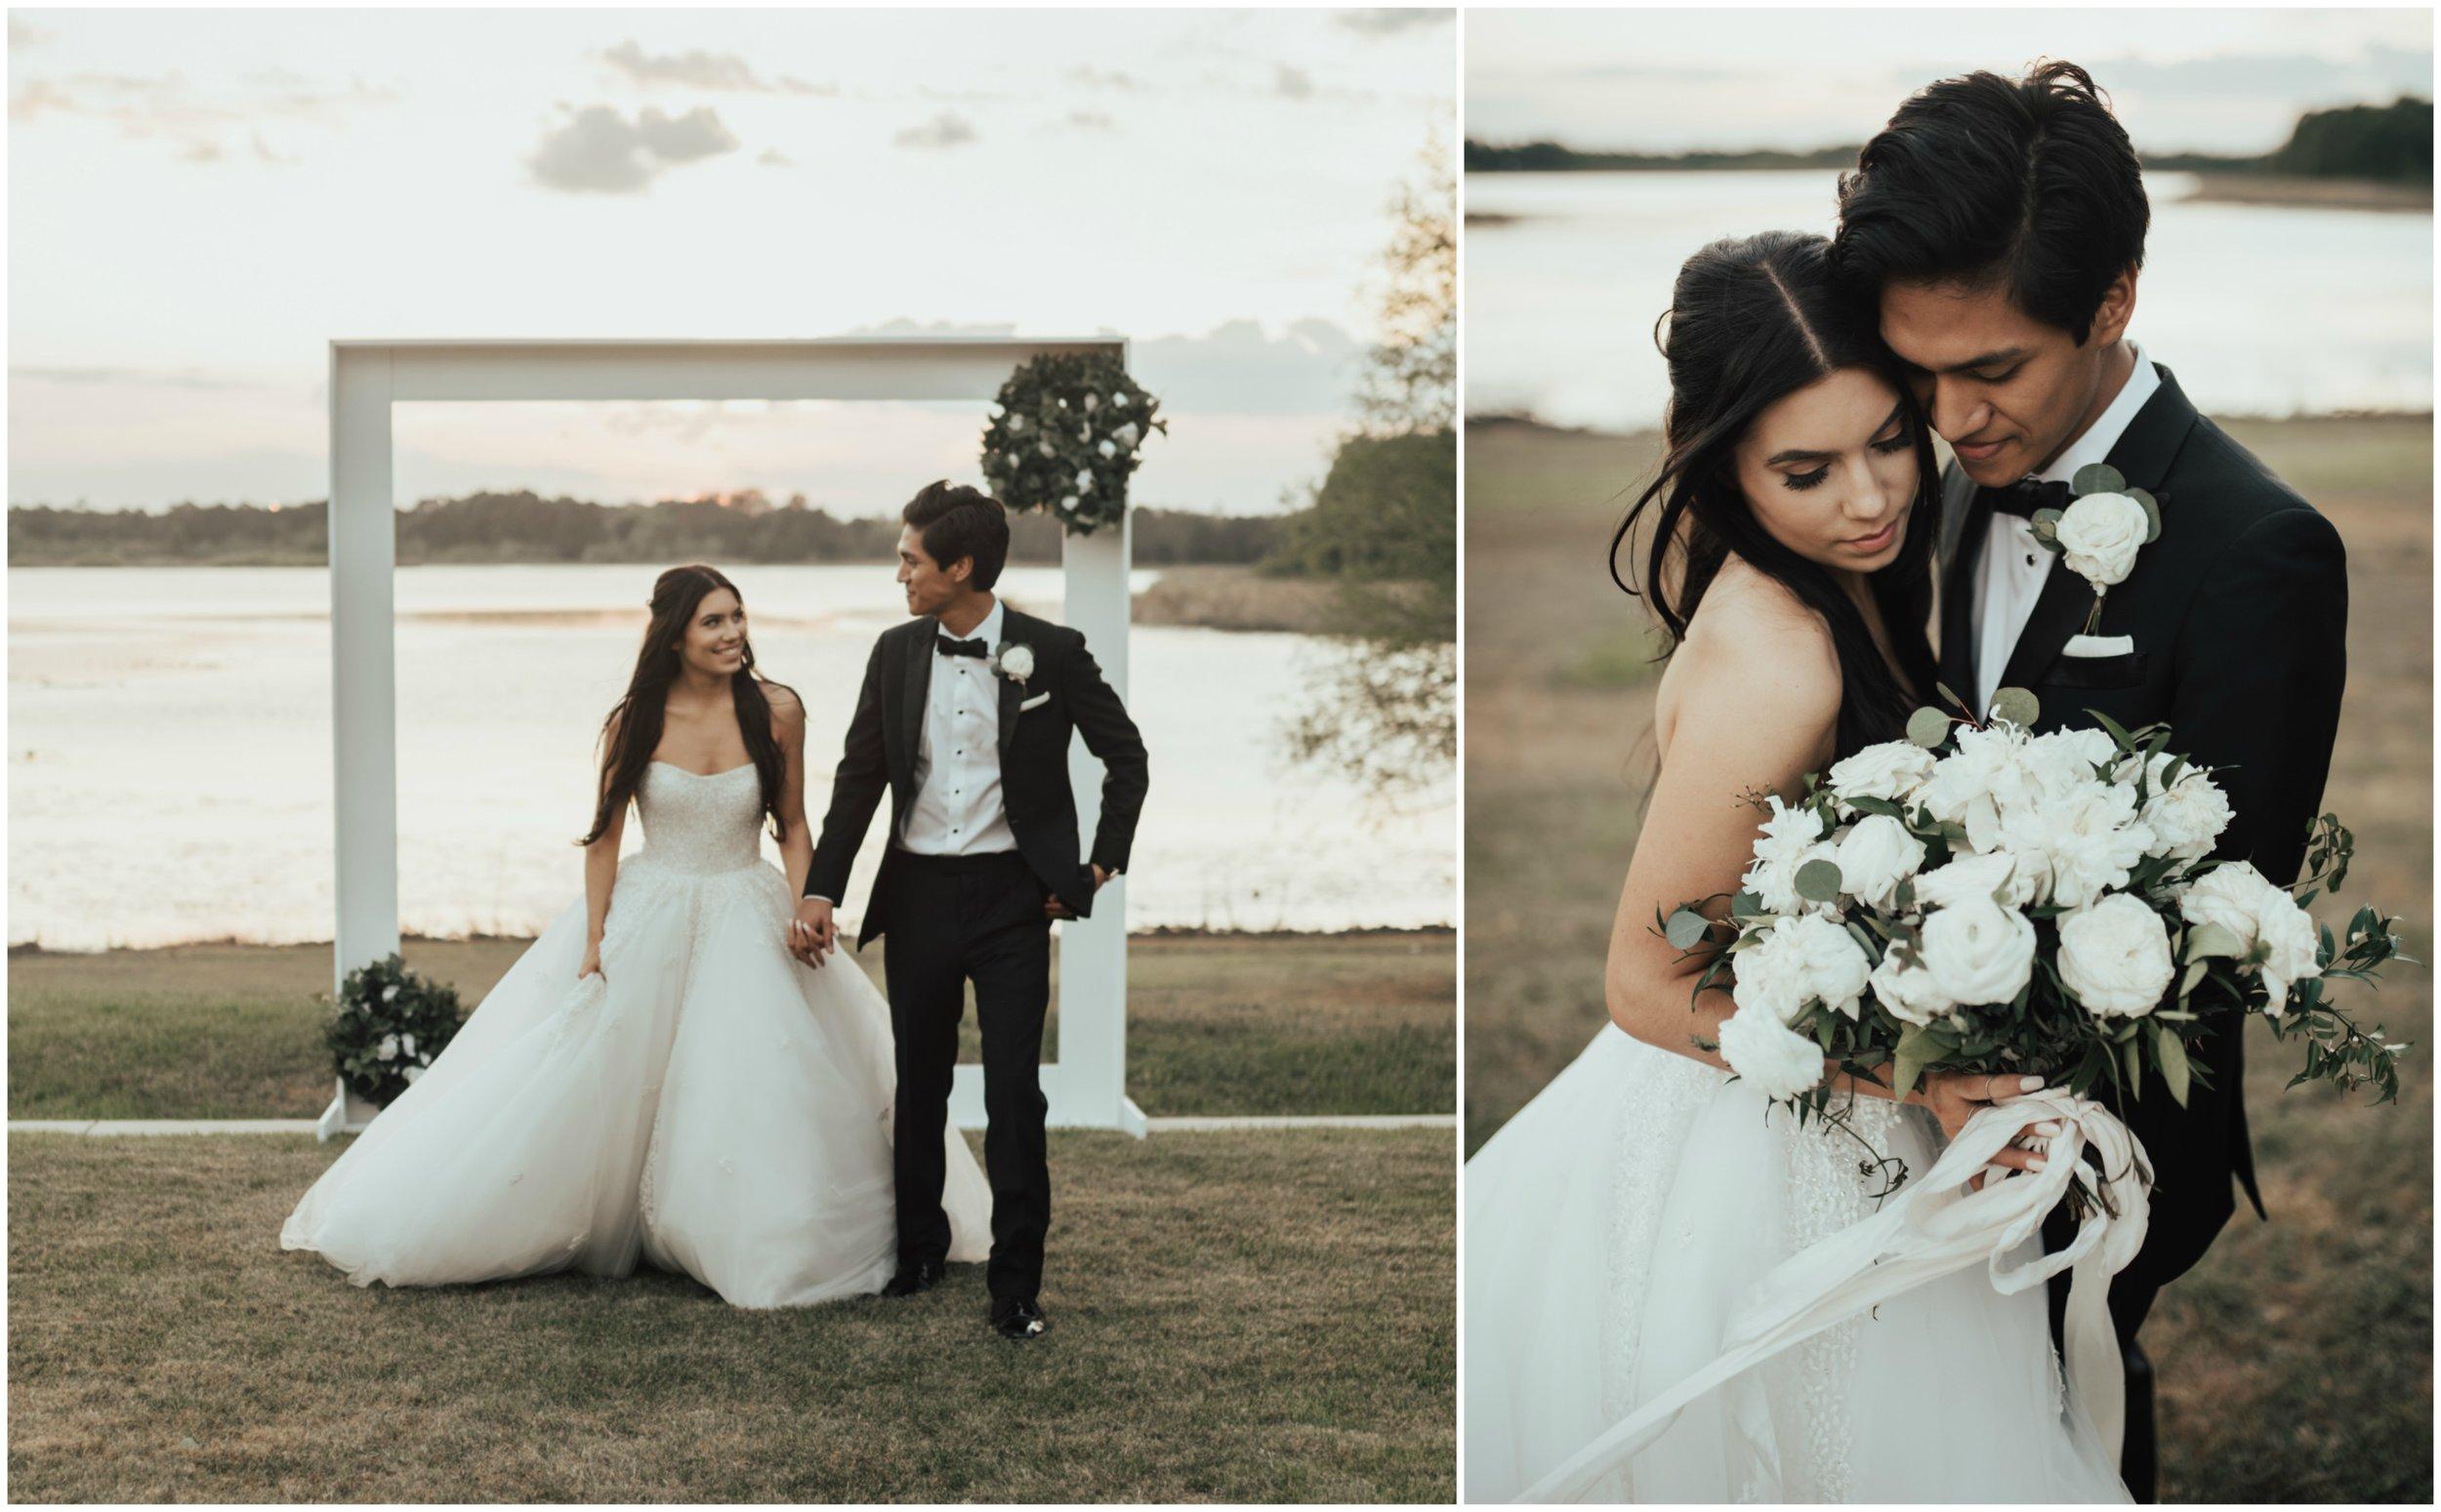 taylor-miguel-wedding-lake-mary-evening-portraits.jpg